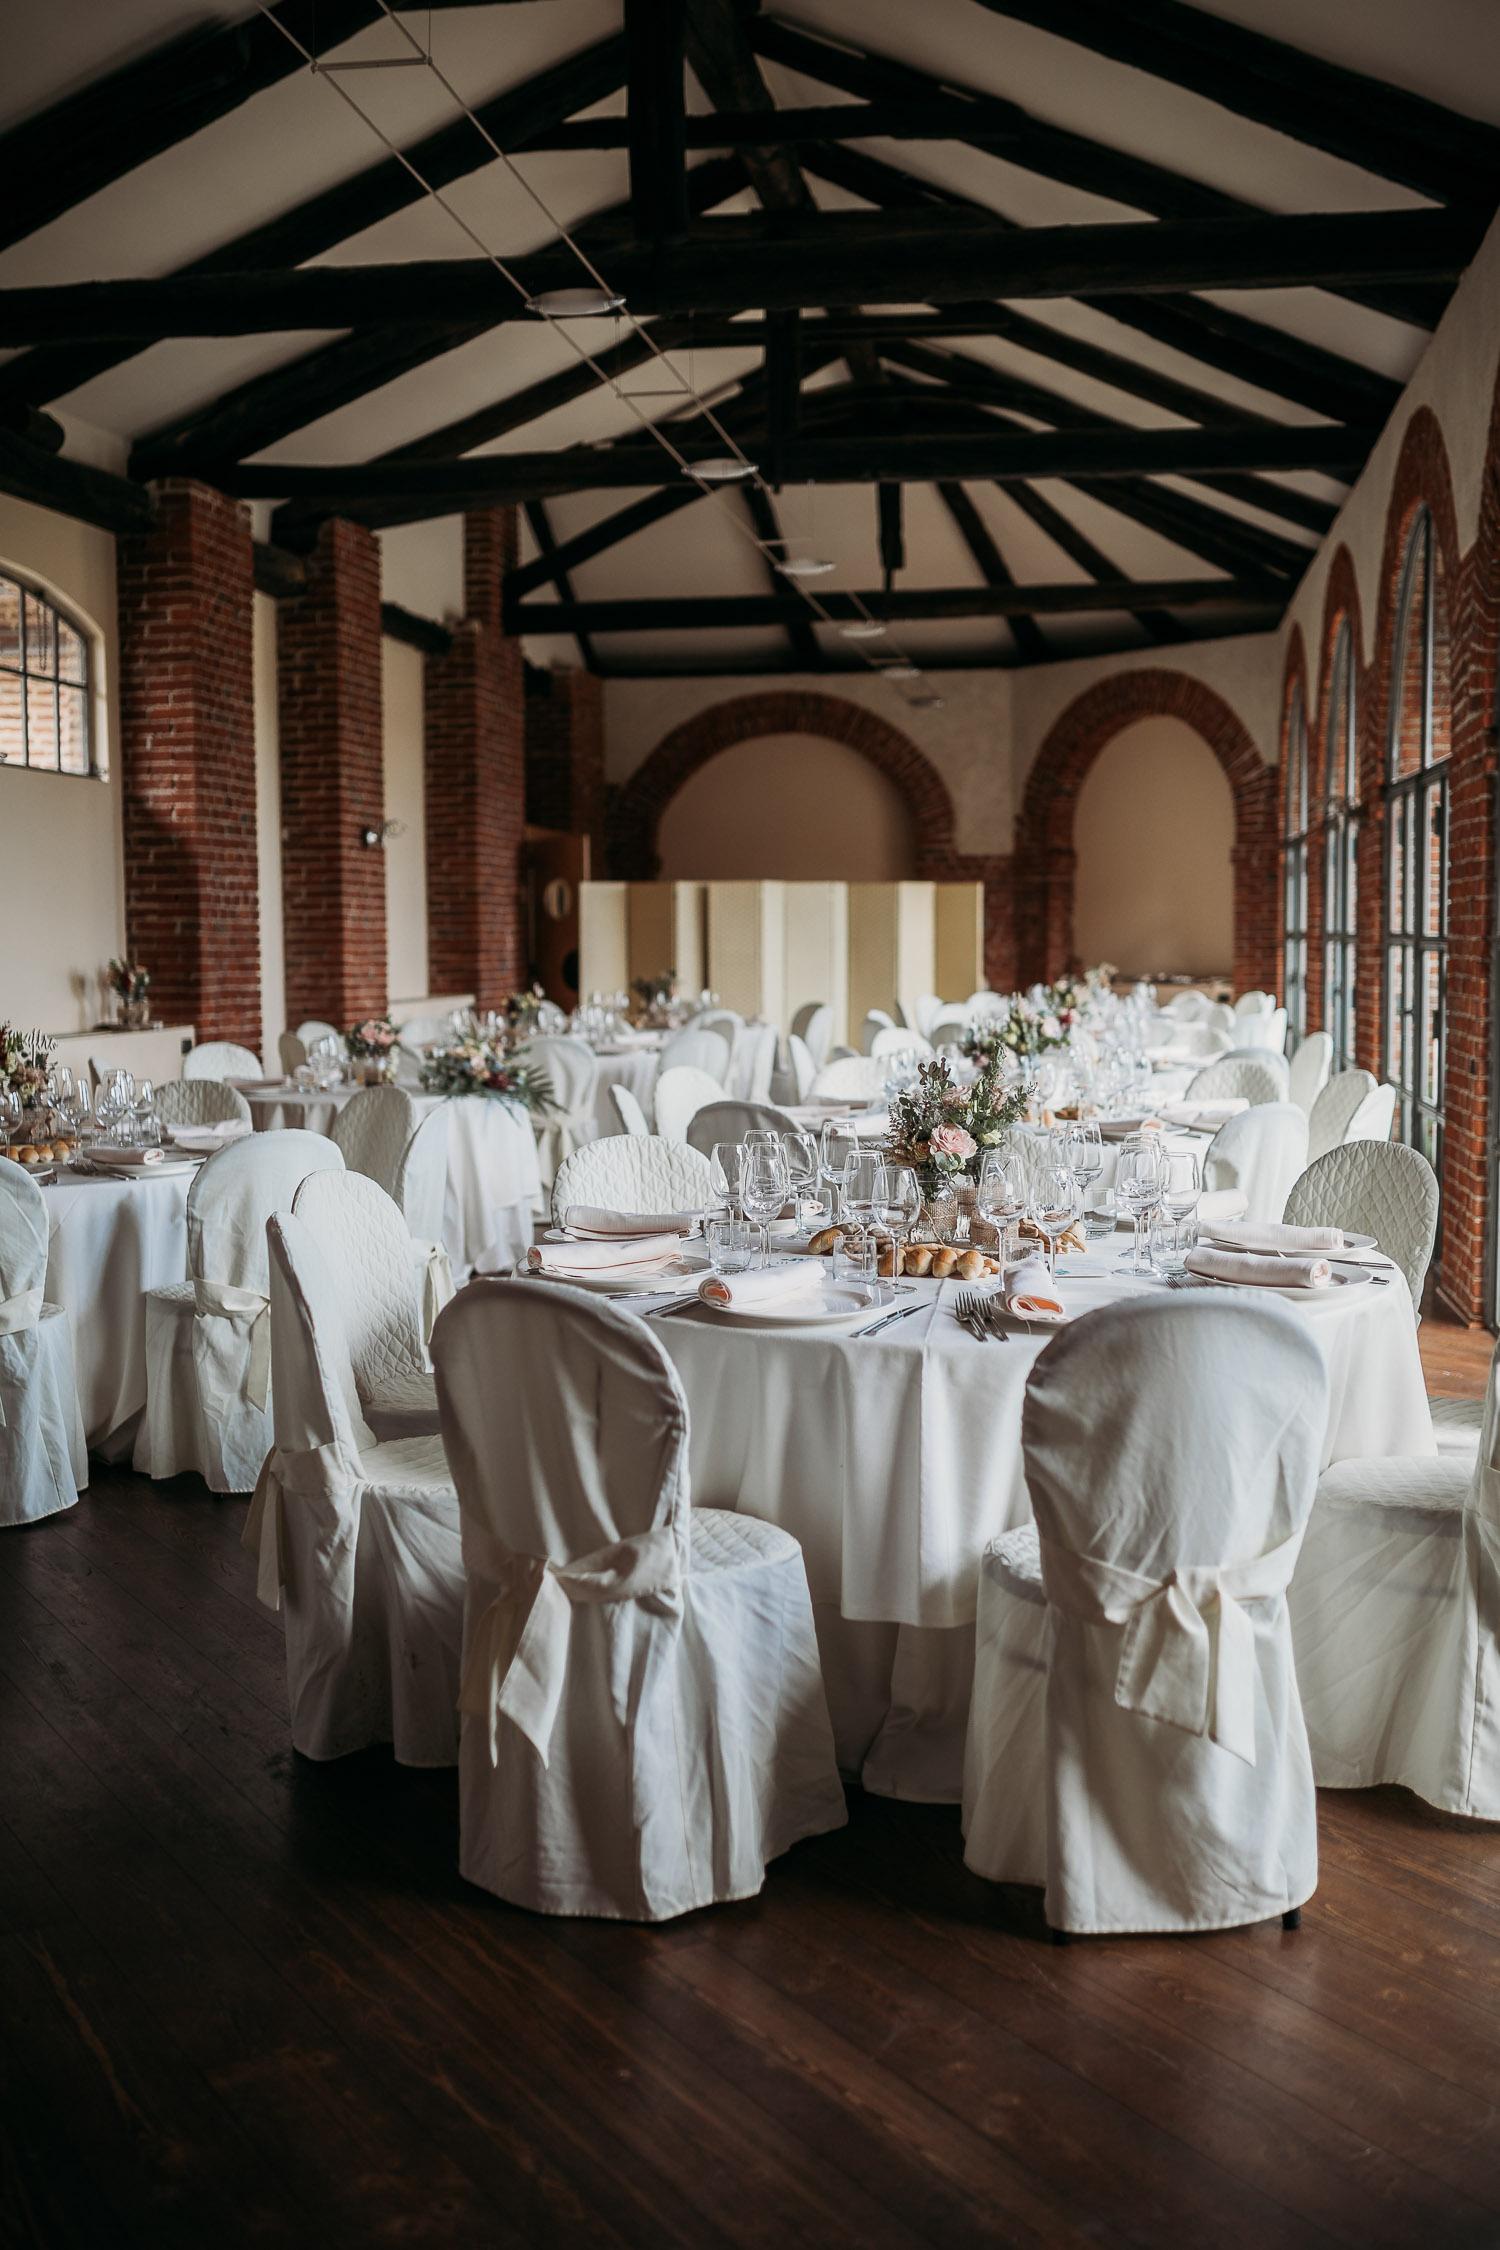 Allestimento sala del matrimonio a Tenuta Tamburnin, Piemonte